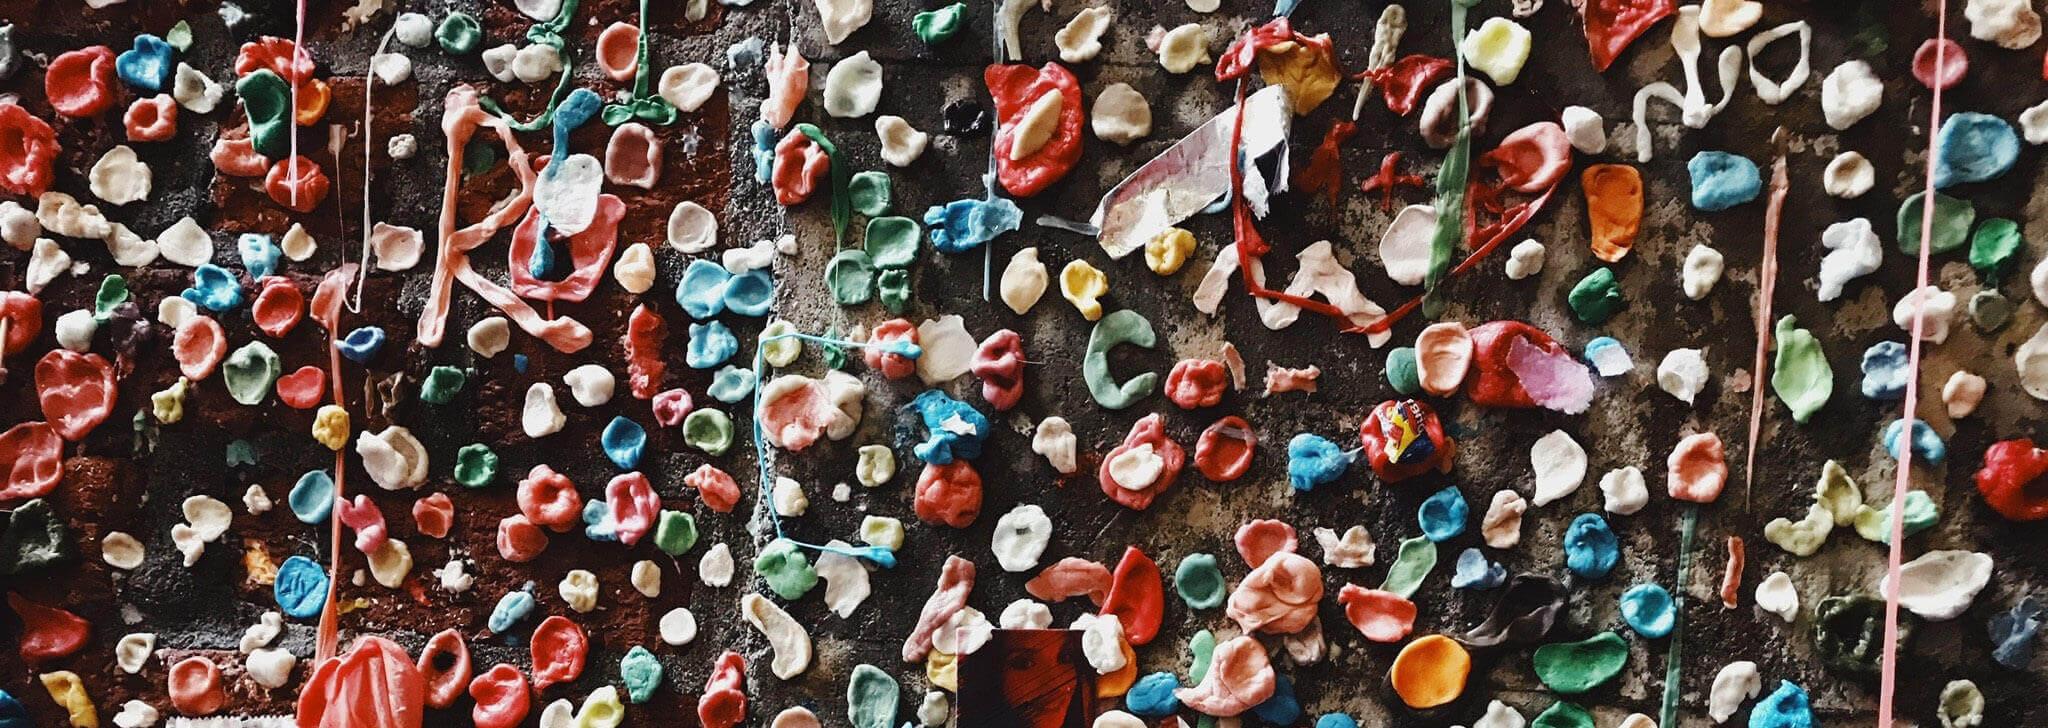 Chewing Gum Is Plastic